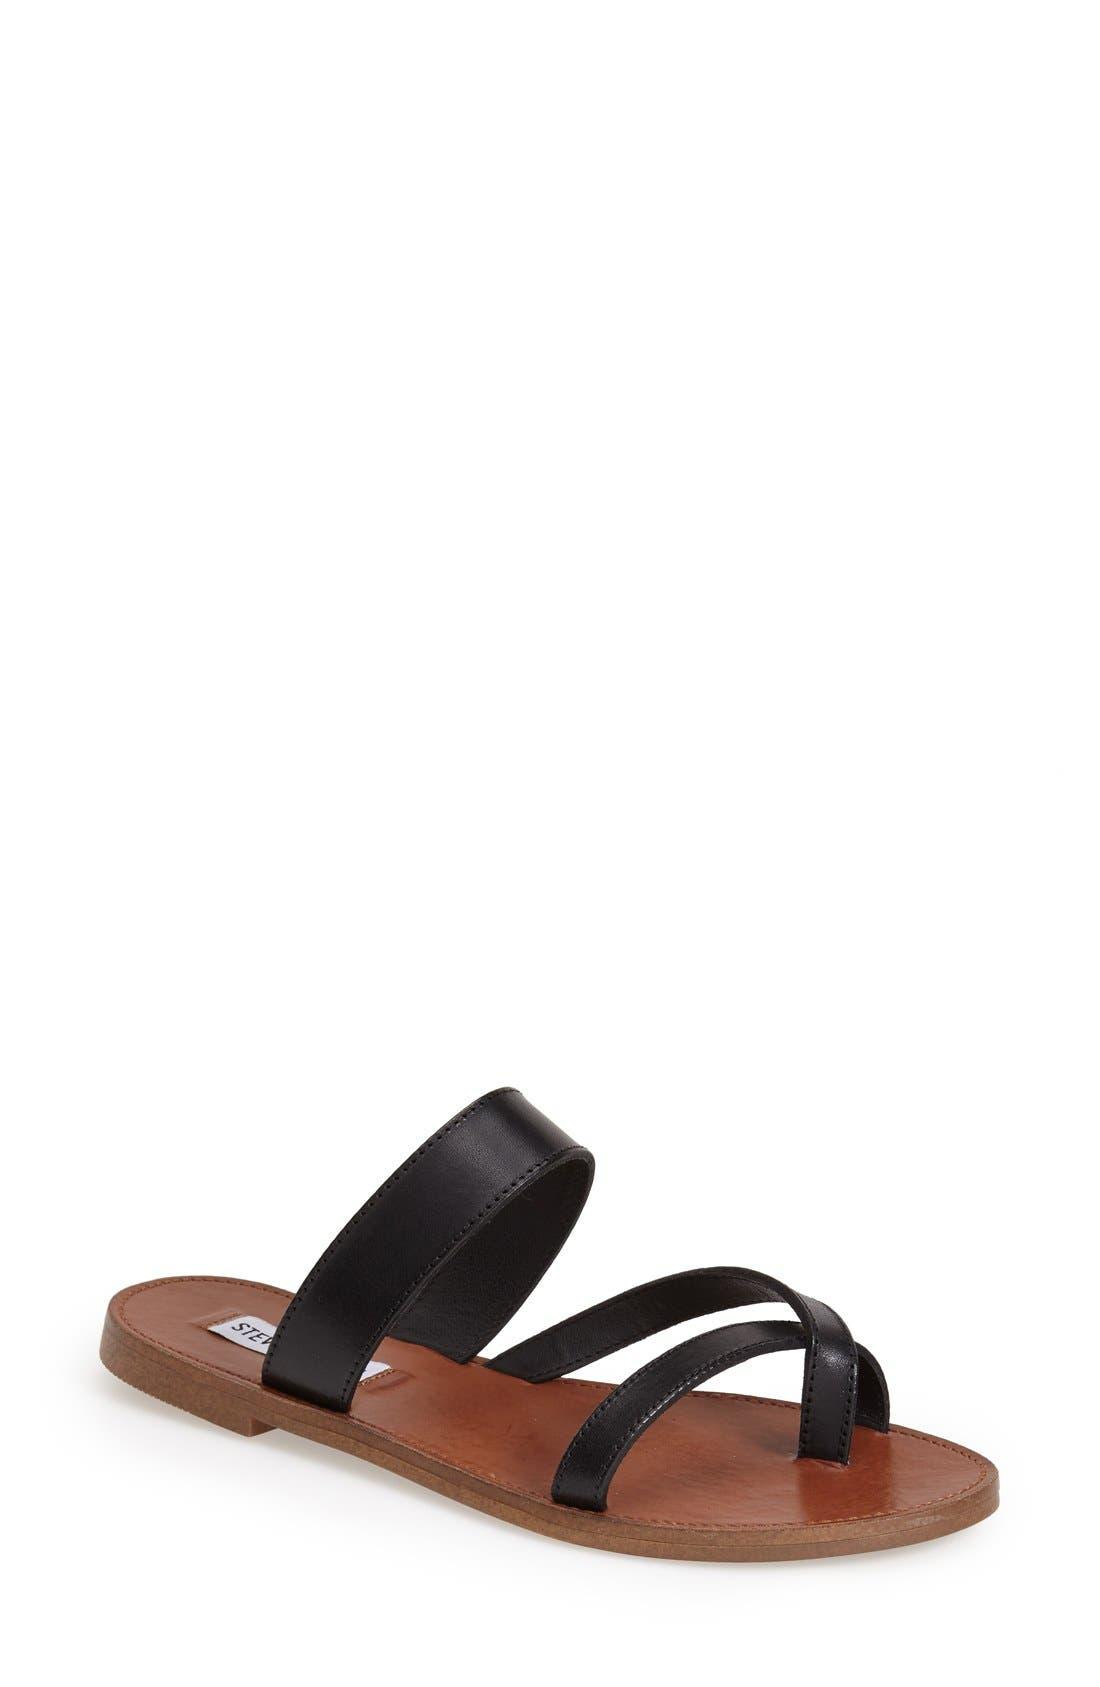 Main Image - Steve Madden 'Aintso' Strappy Leather Toe Ring Sandal (Women)